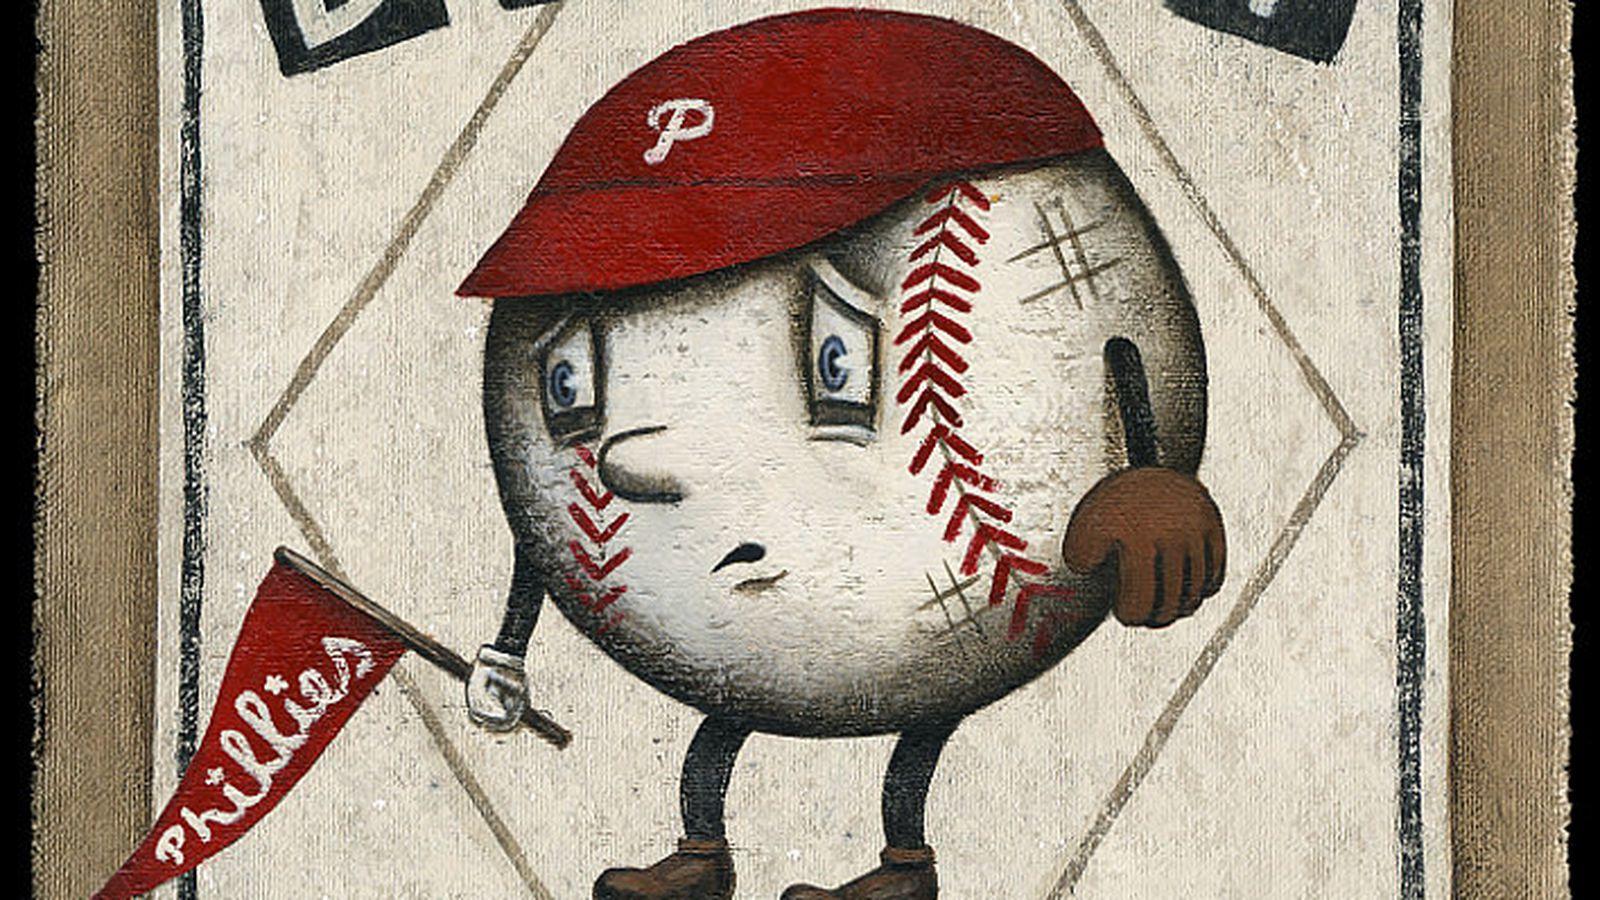 The_dirty_inning_finish_3_large___black_trim.0